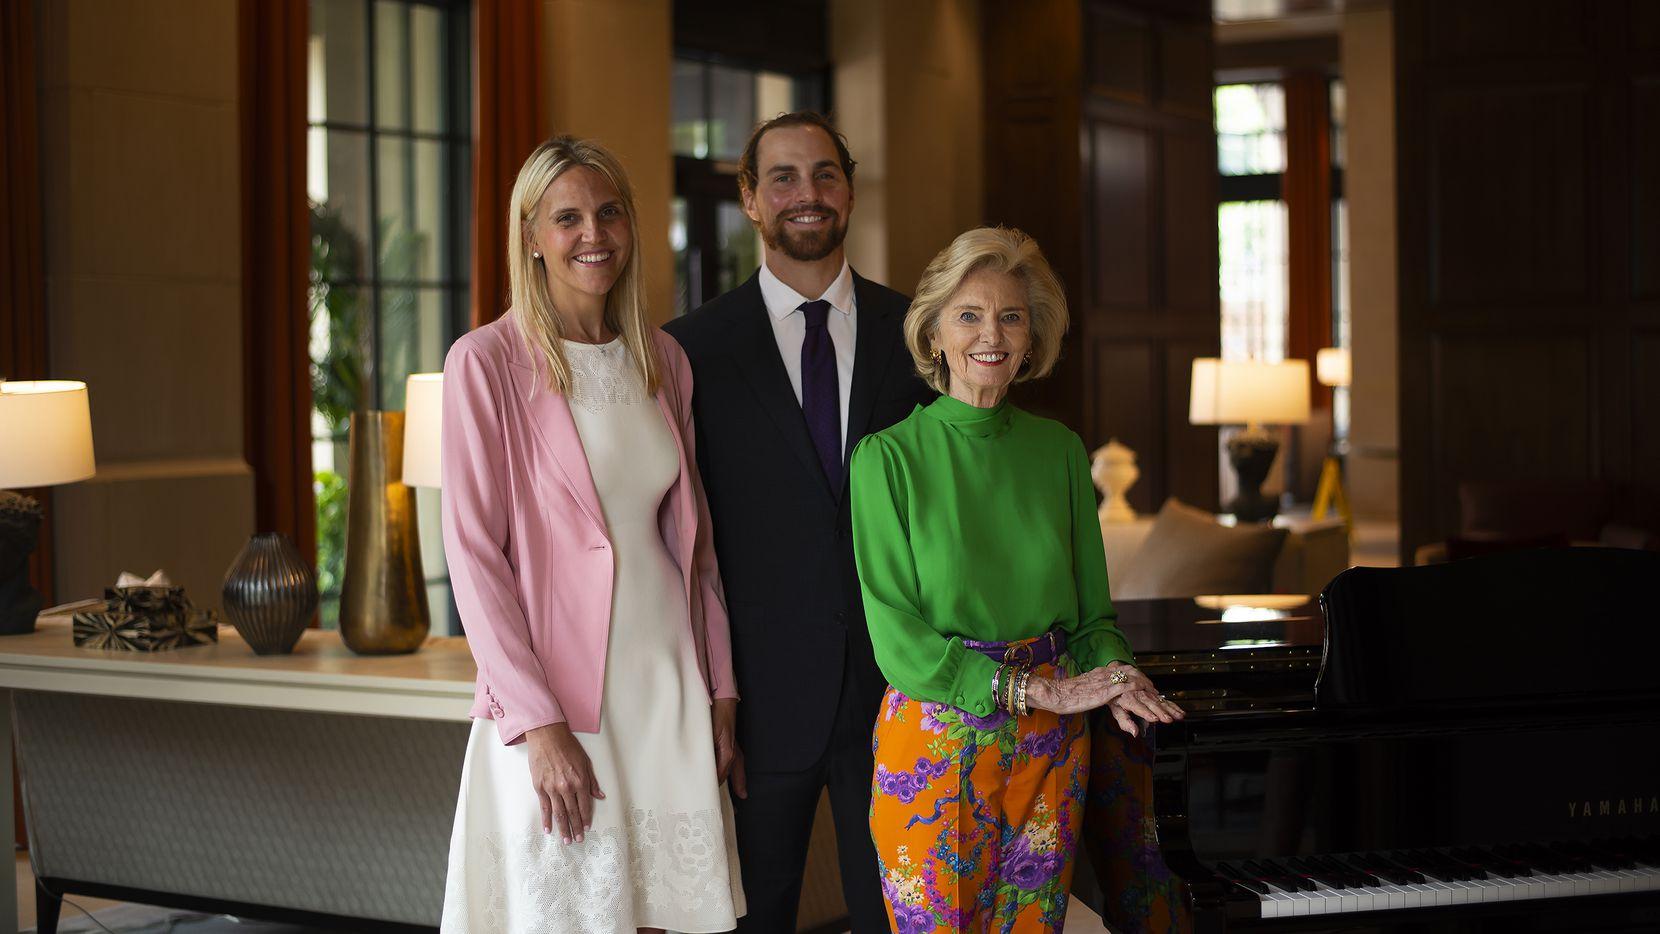 Erin Young Garrett (left), Keith Conlon and Allie Beth Allman lead the top luxury real estate brokerage Allie Beth Allman & Associates.